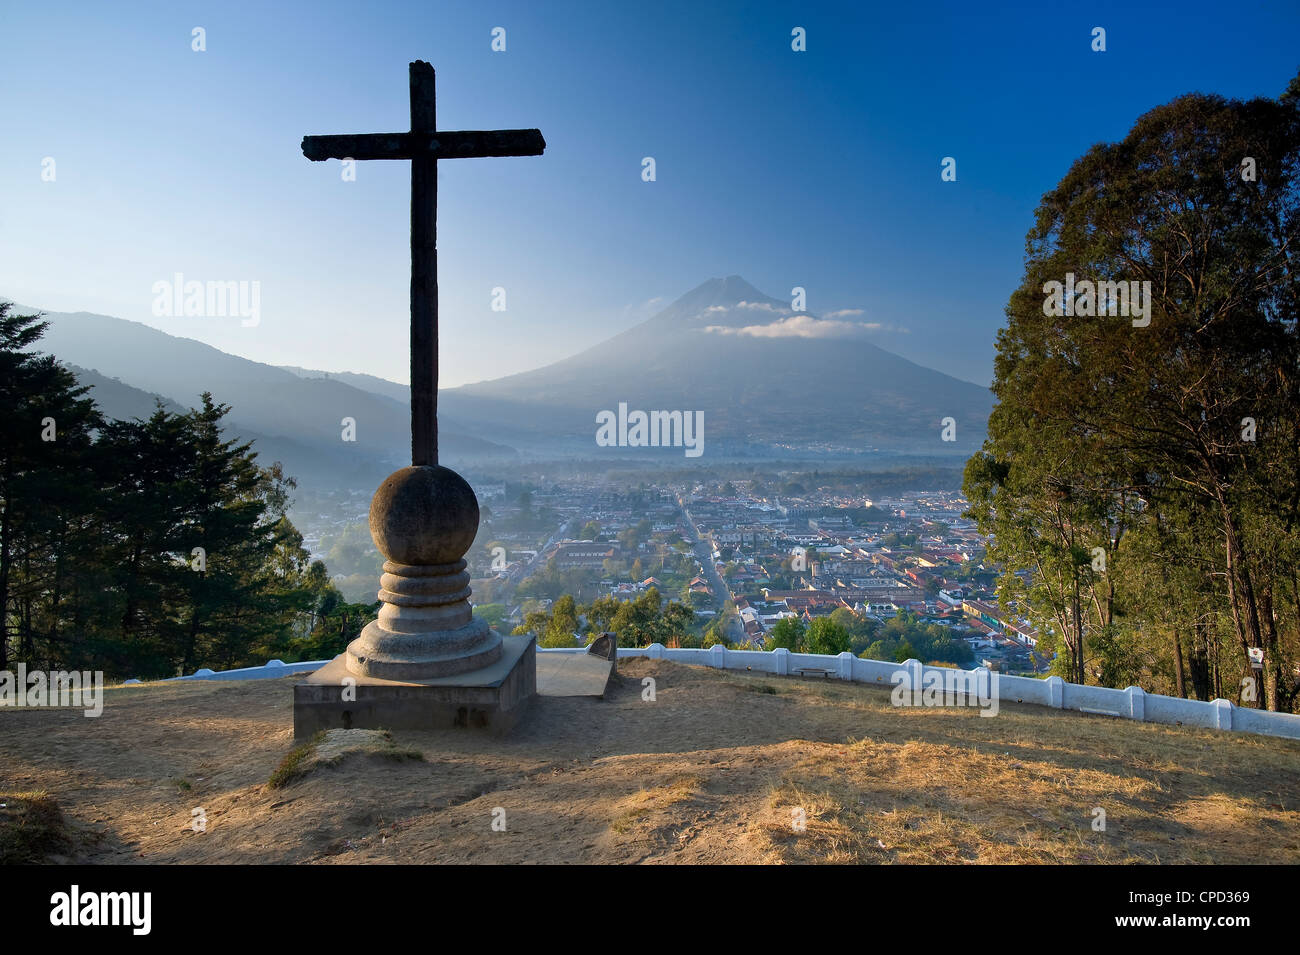 Mirador de la Cruz, Antigua, Guatemala, Central America - Stock Image